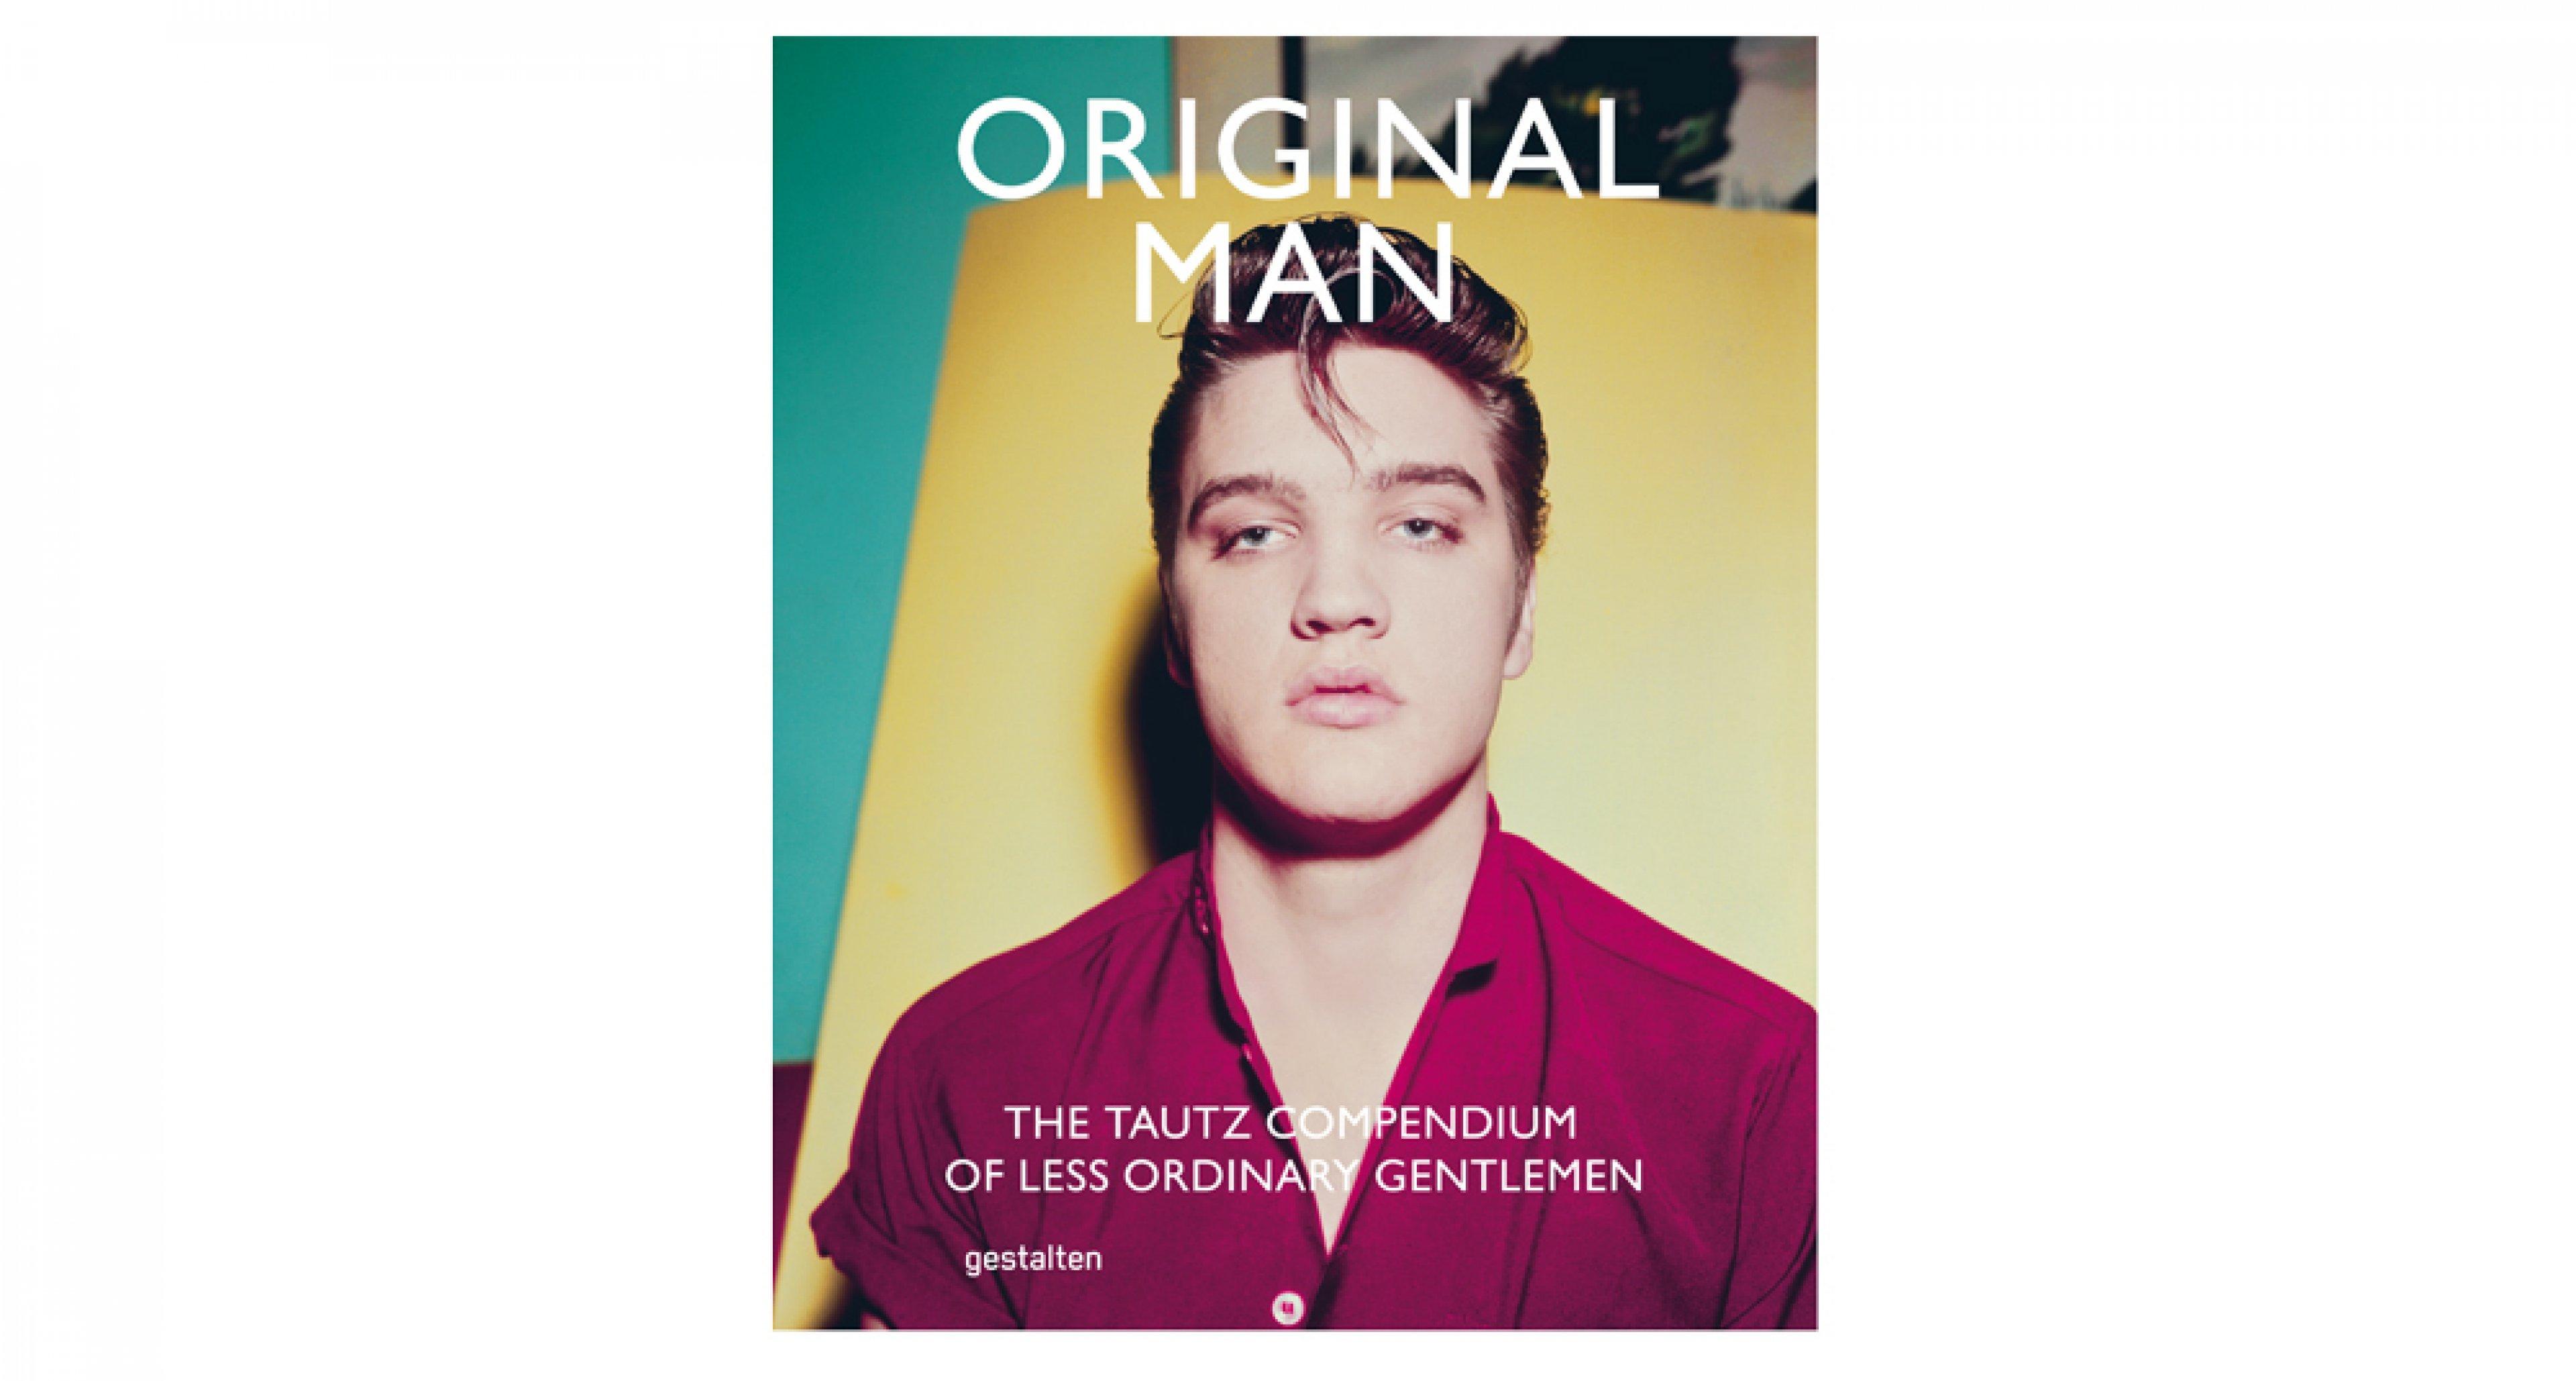 Original Man, Copyright Gestalten 2014